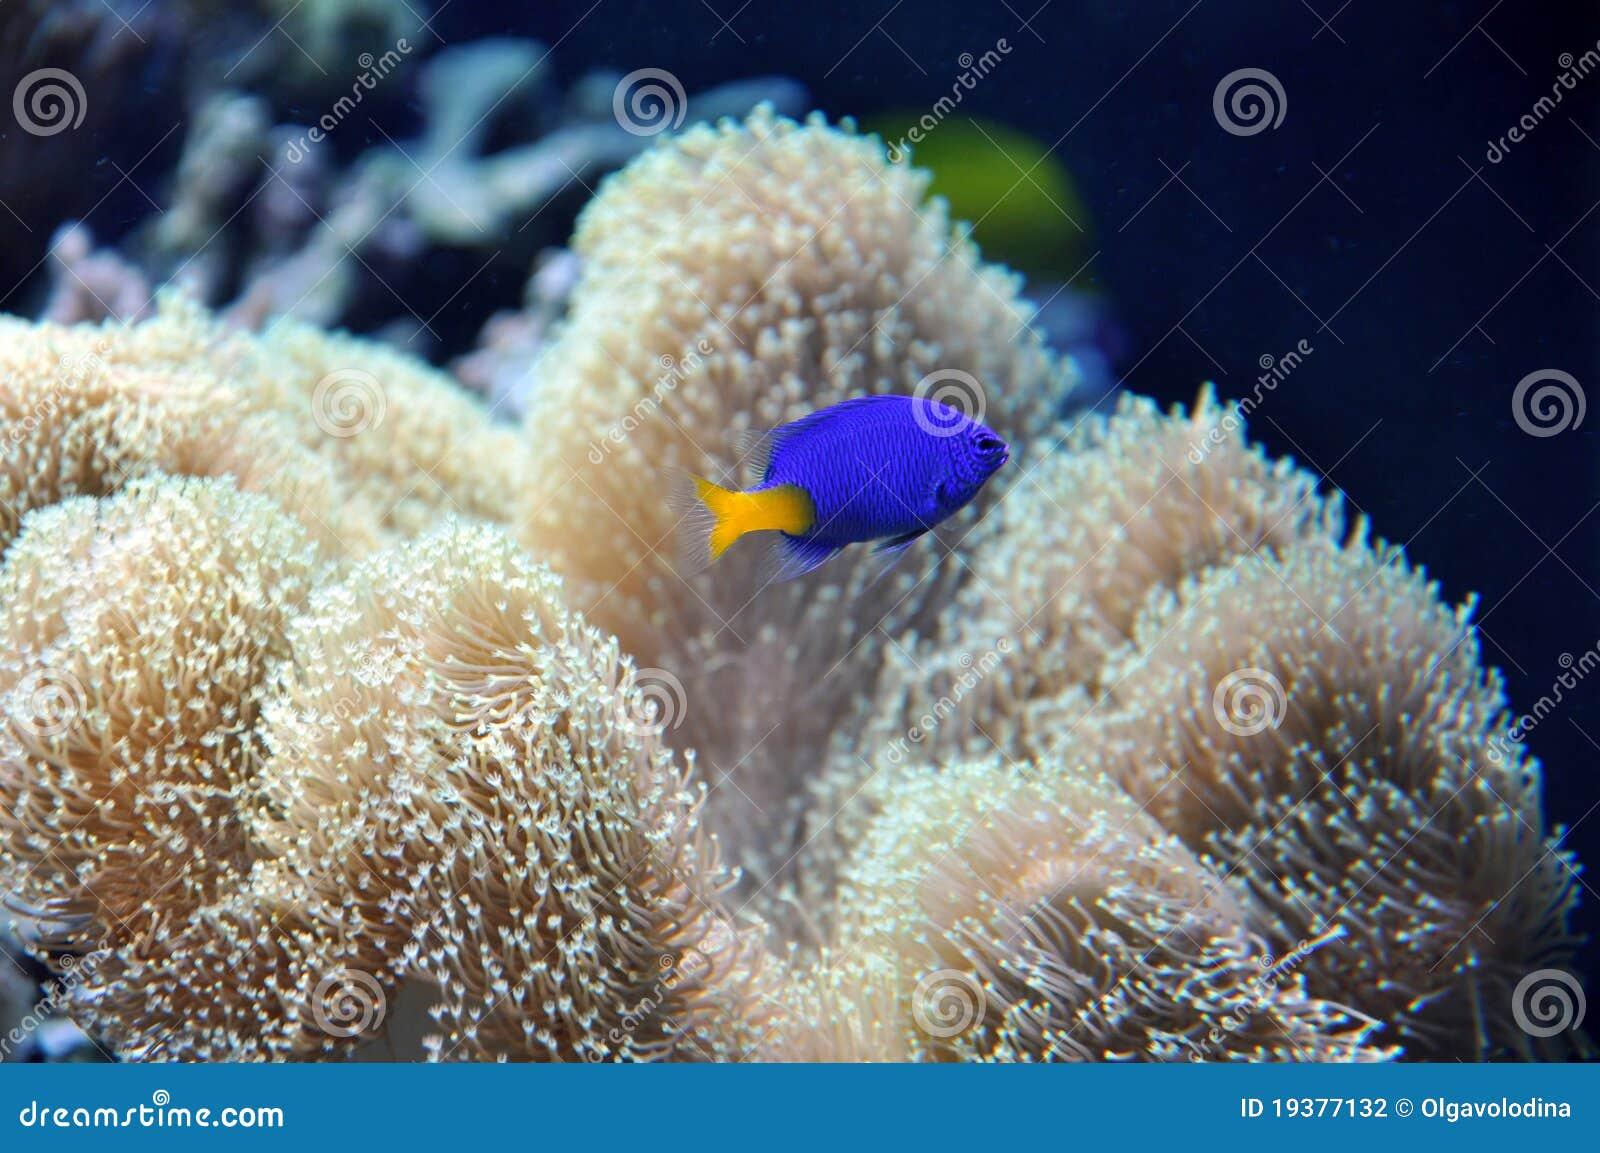 Aquarium marin avec un poisson bleu photographie stock for Aquarium avec poisson